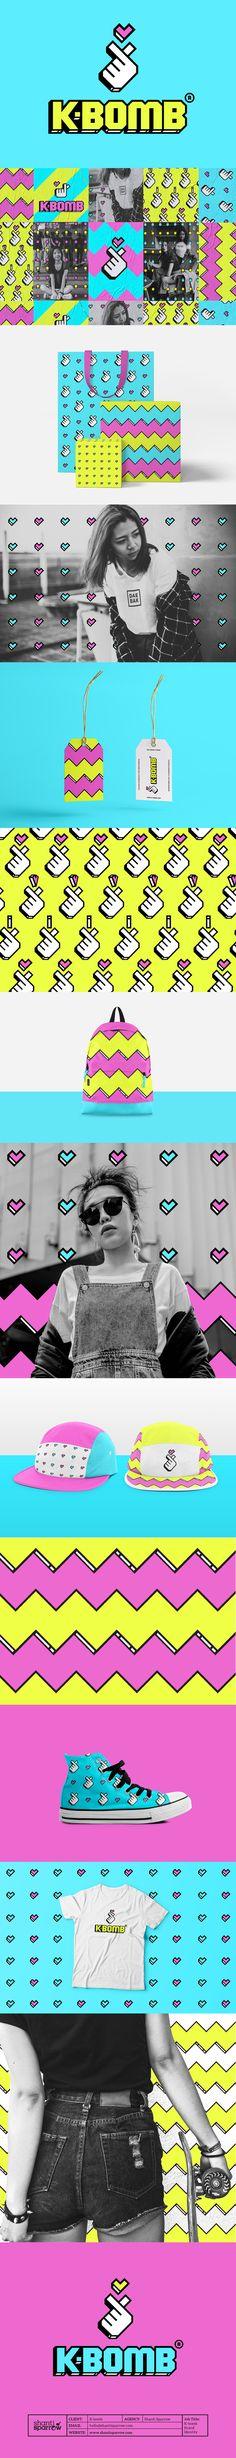 Designed by Shanti Sparrow at www.shantisparrow.com. #branding #graphicdesign #posterdesign #poster #designspiration #designer #pop #logo #logodesign #packaging #bag design #kpop #illustration #illustrativebranding #dynamicbranding #layout #layoutdesign